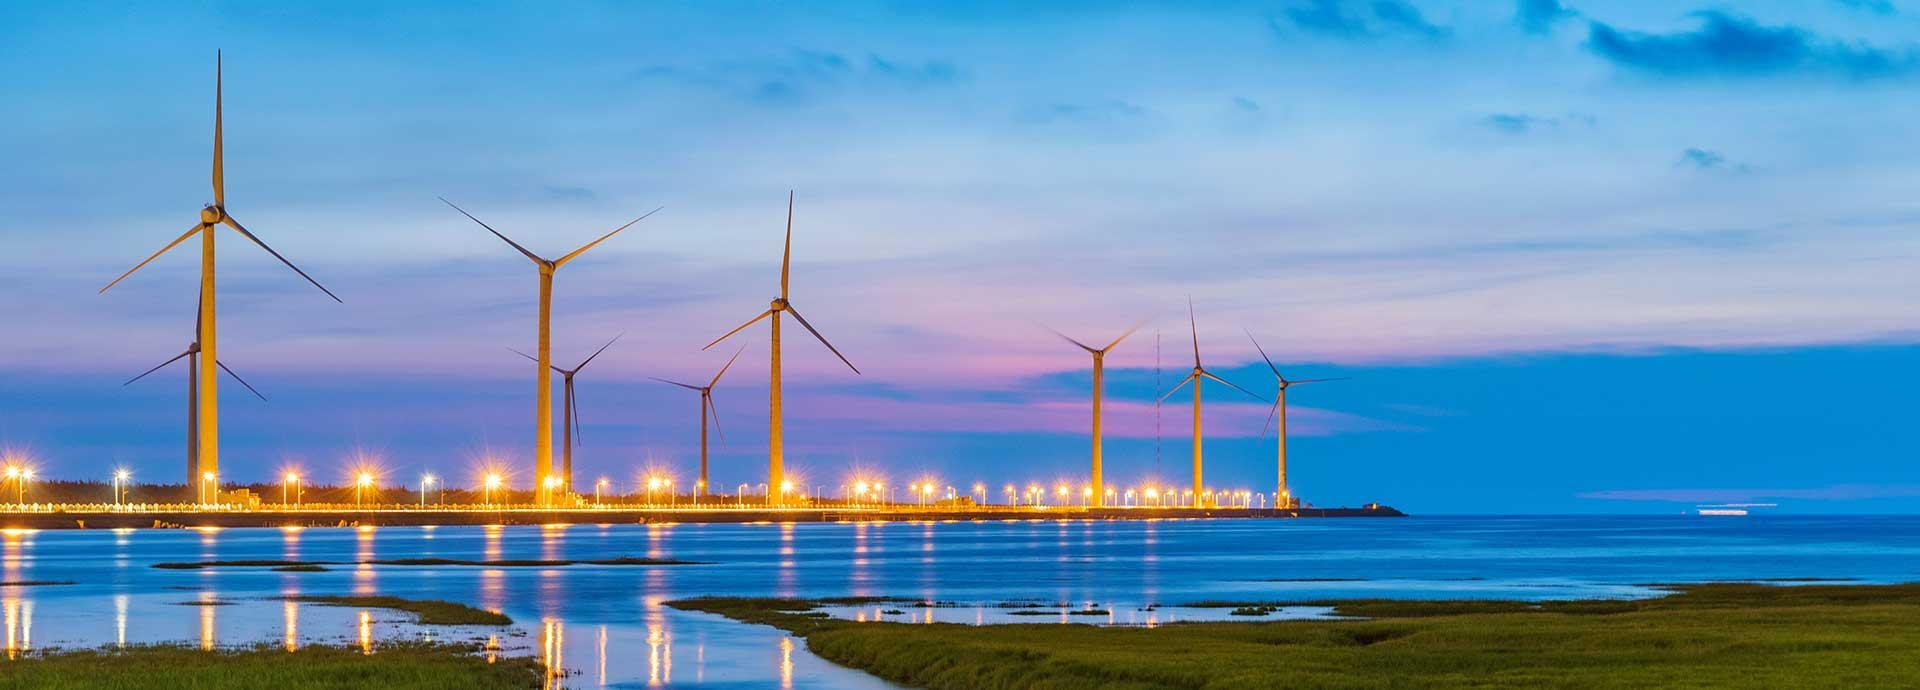 Energy Business 2020